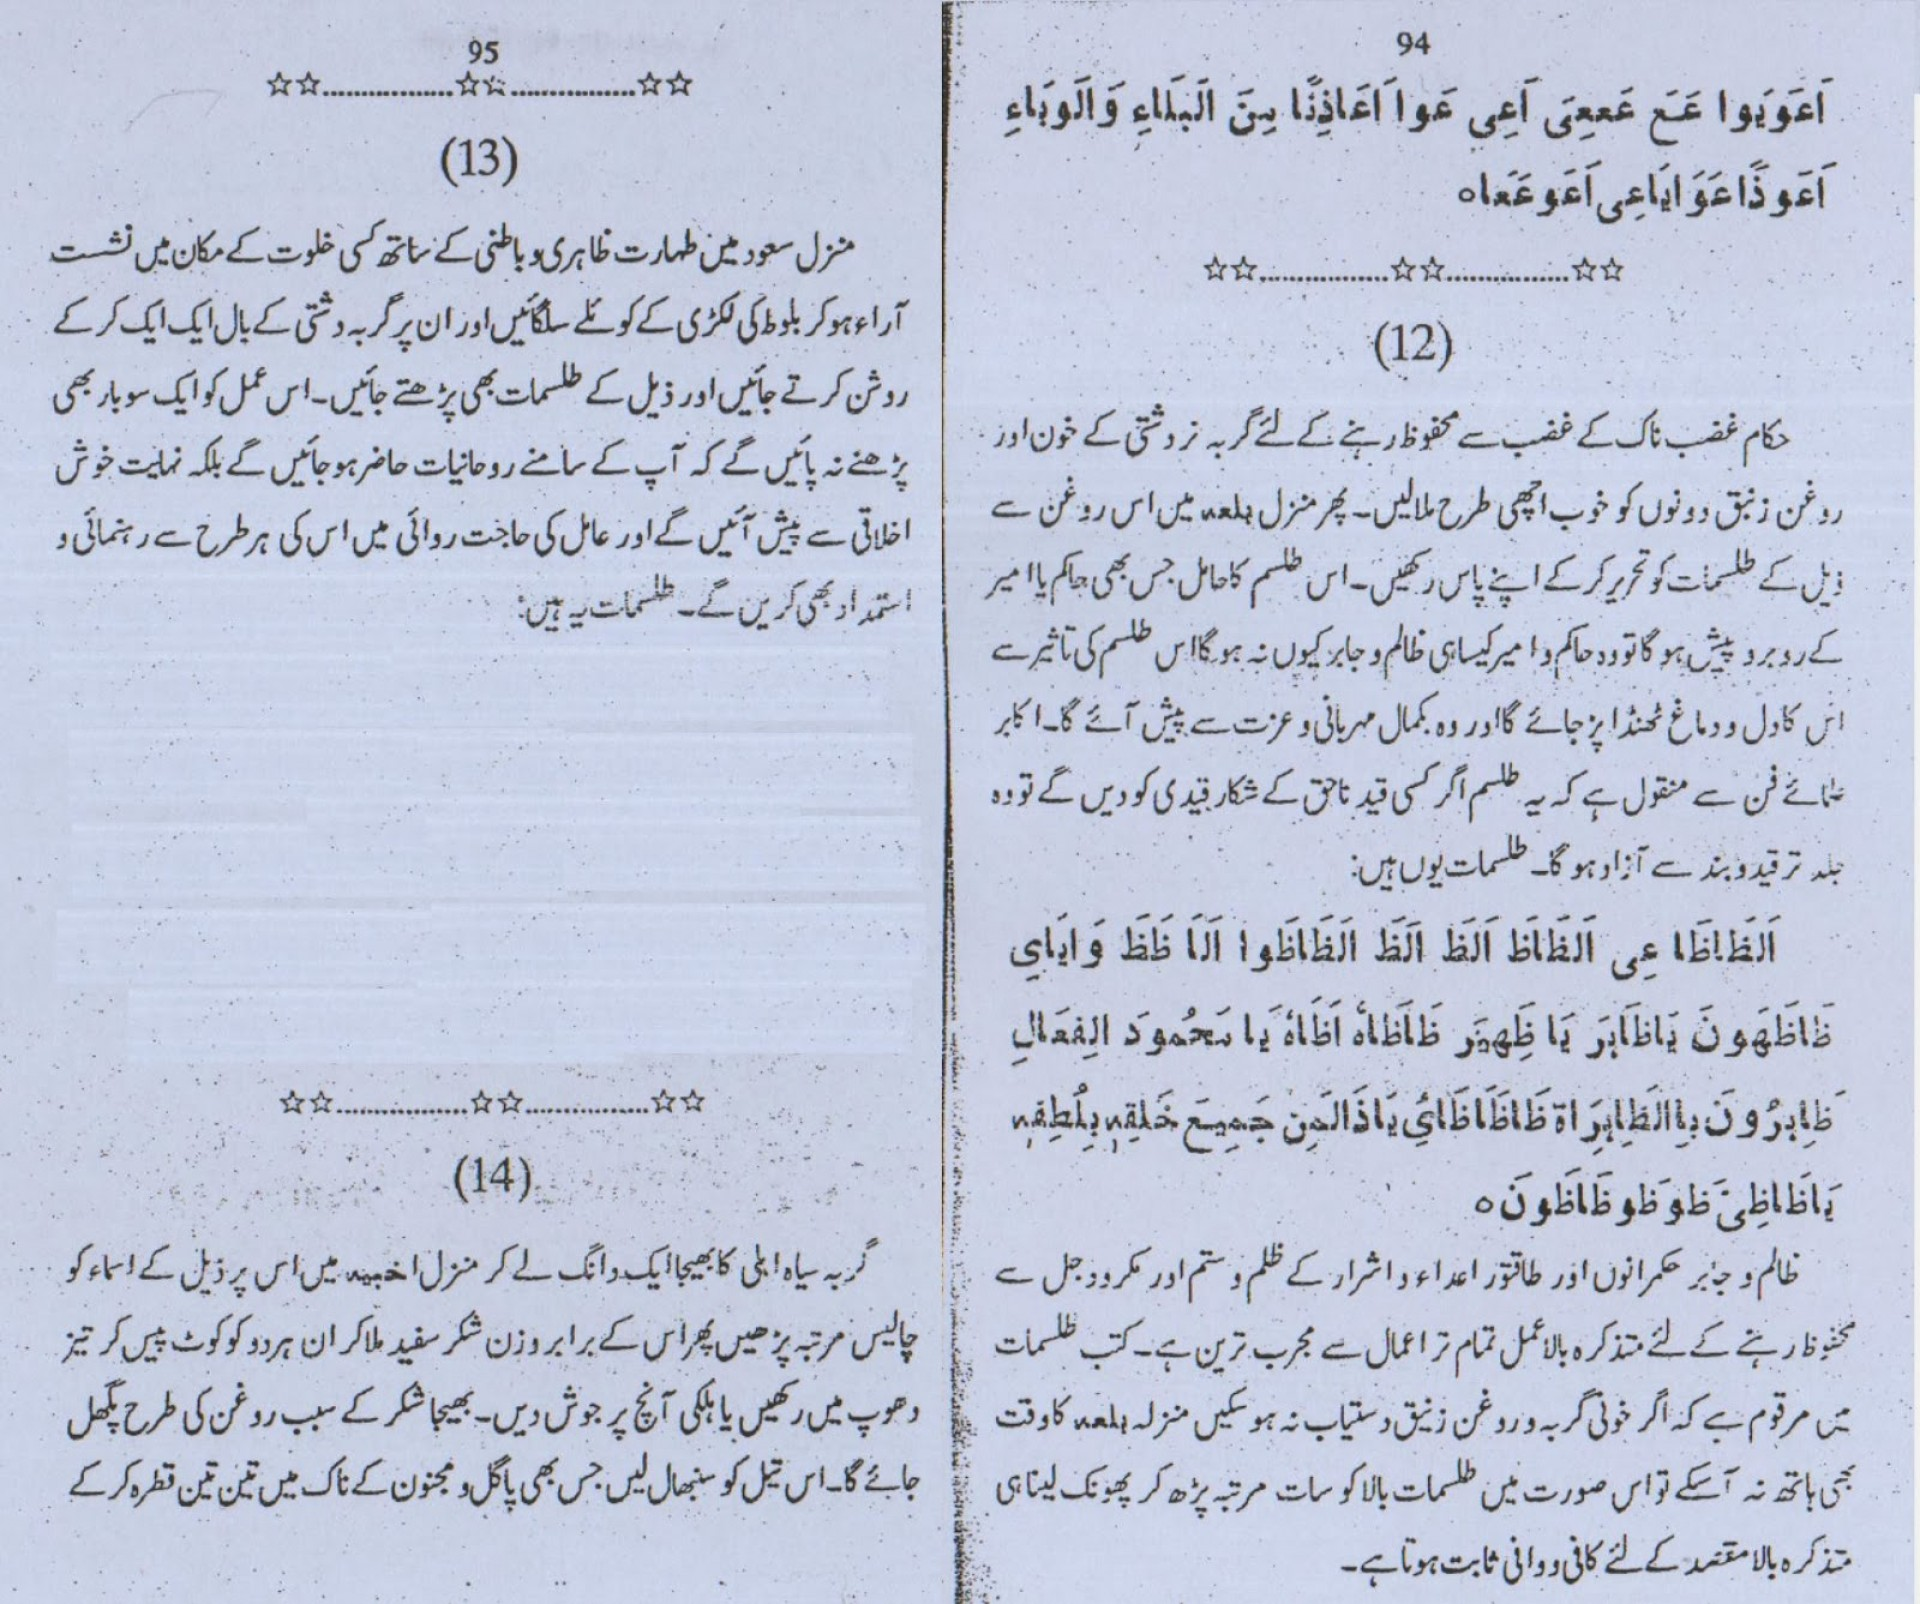 005 Swscan00004 Jpg Harkat Mein Barkat Essay In Urdu Amazing On Topic Hai Short 1920